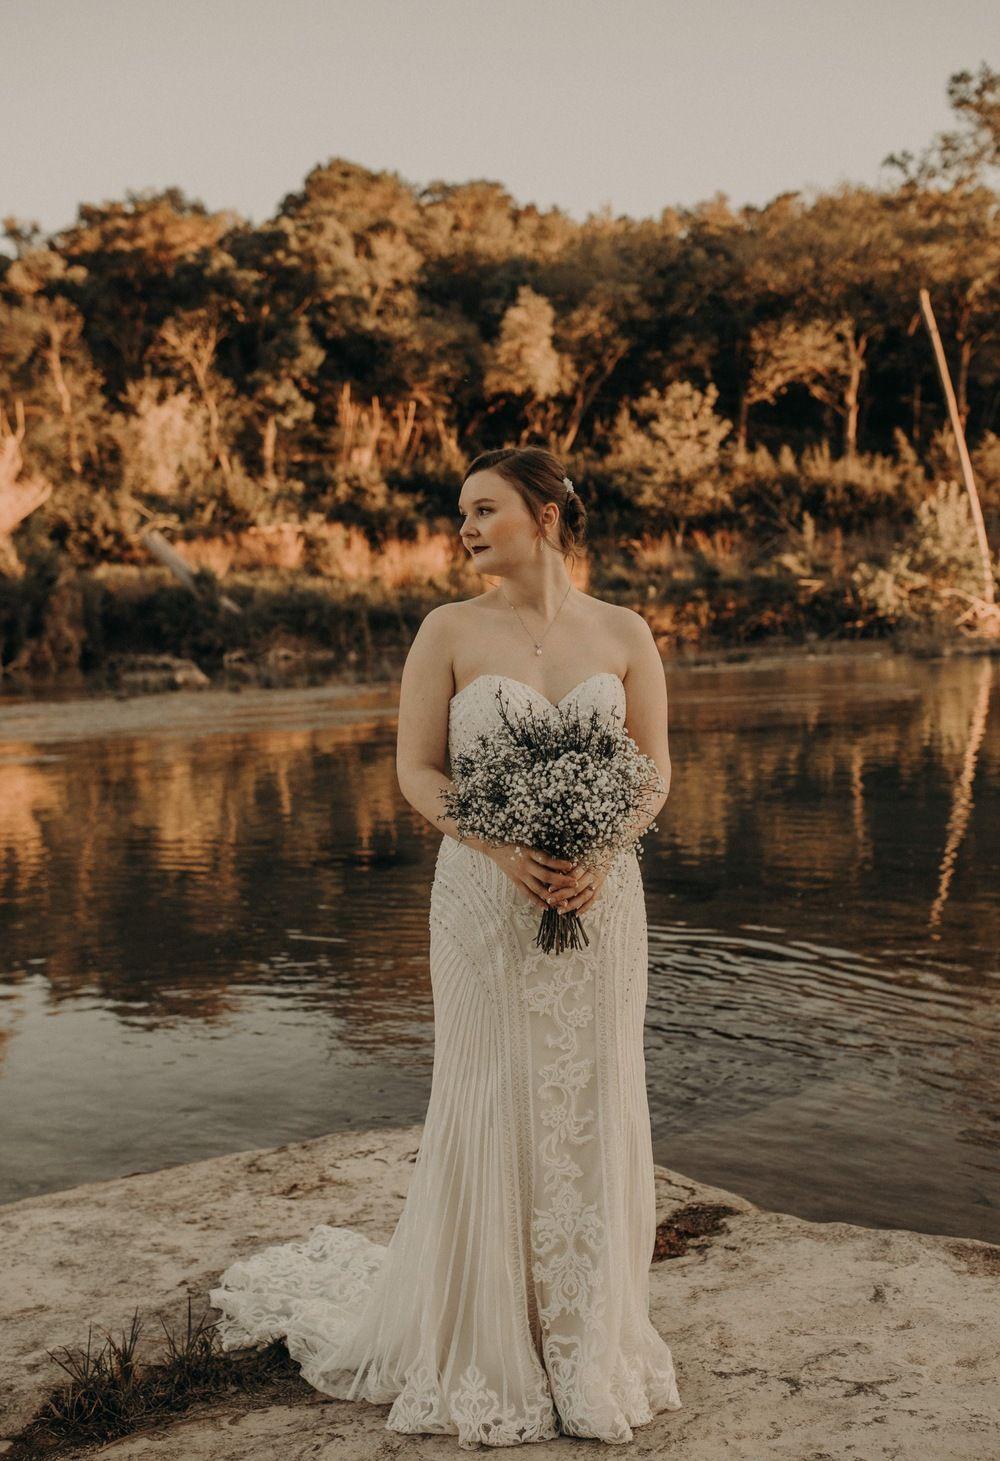 Waters Point Wedding in Wimberley, Texas Bohemian